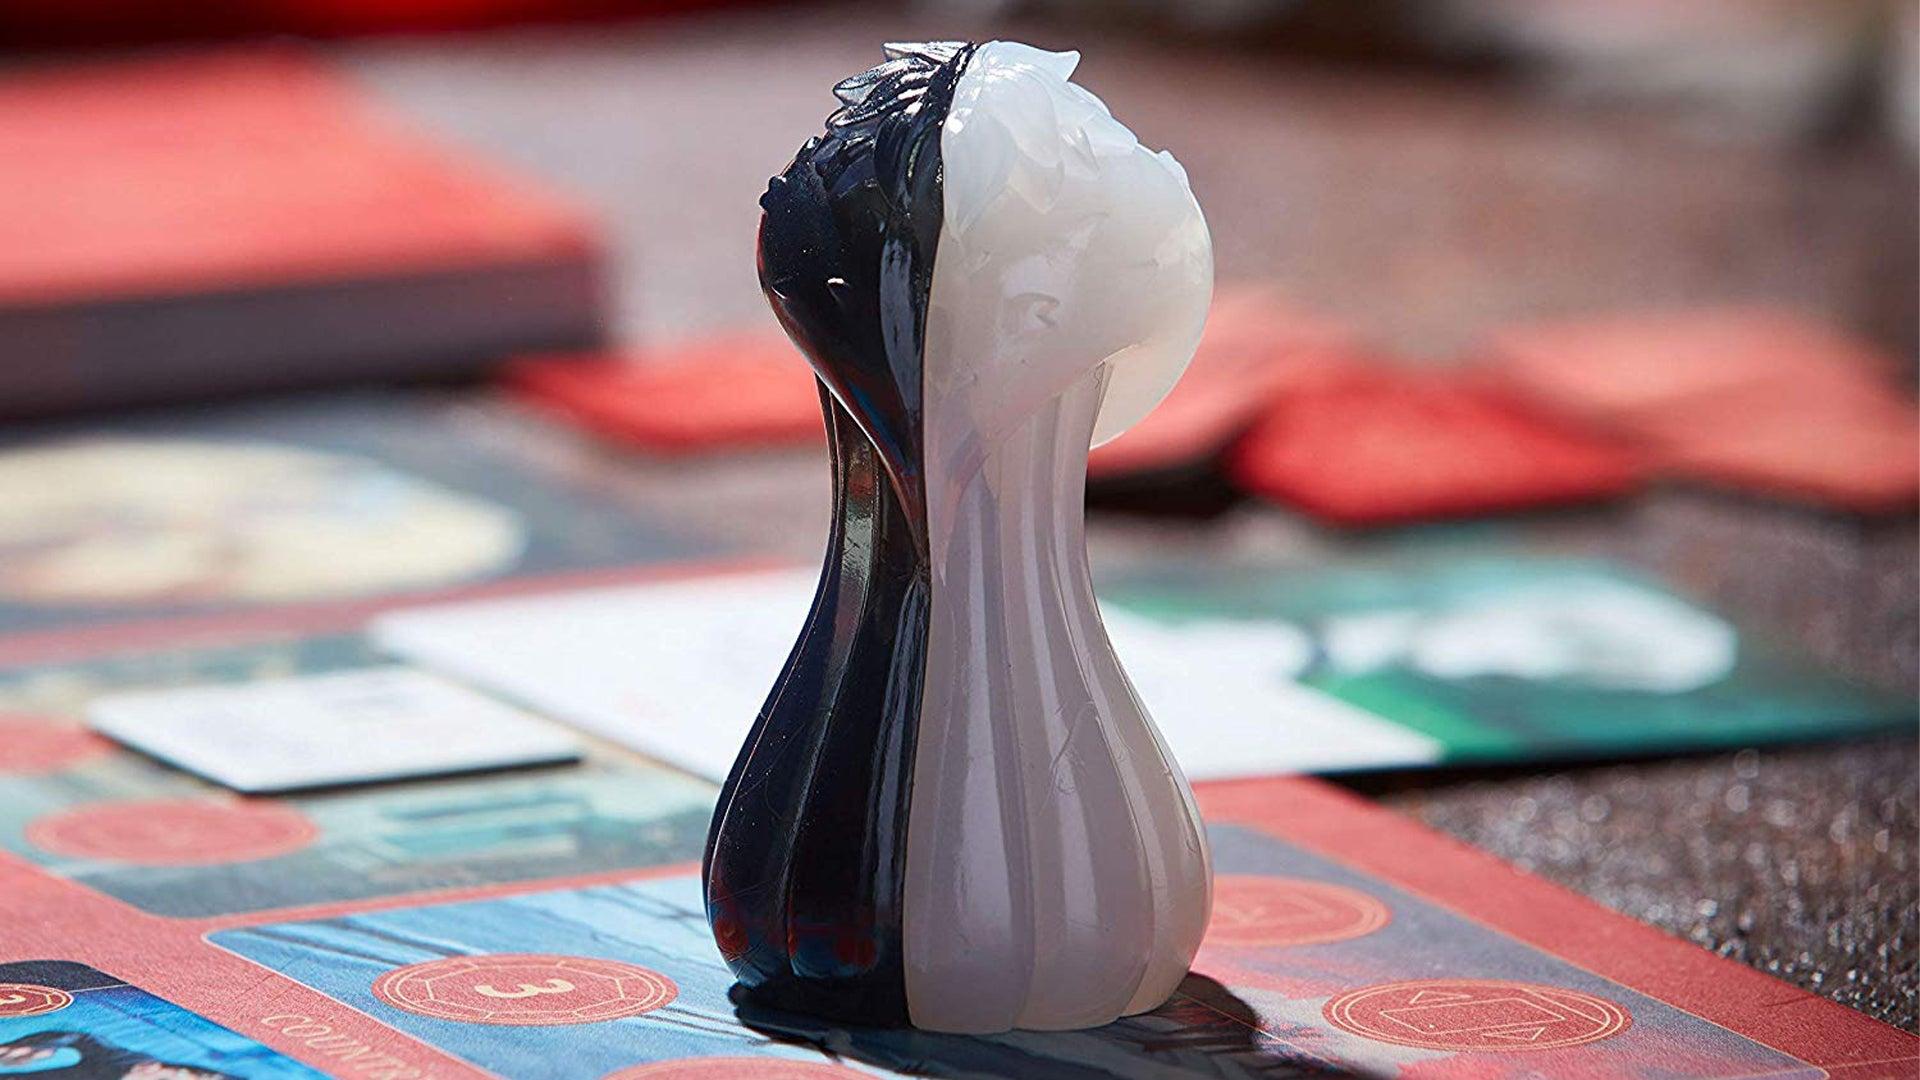 Disney Villainous: Perfectly Wretched board game Cruella de Vil piece